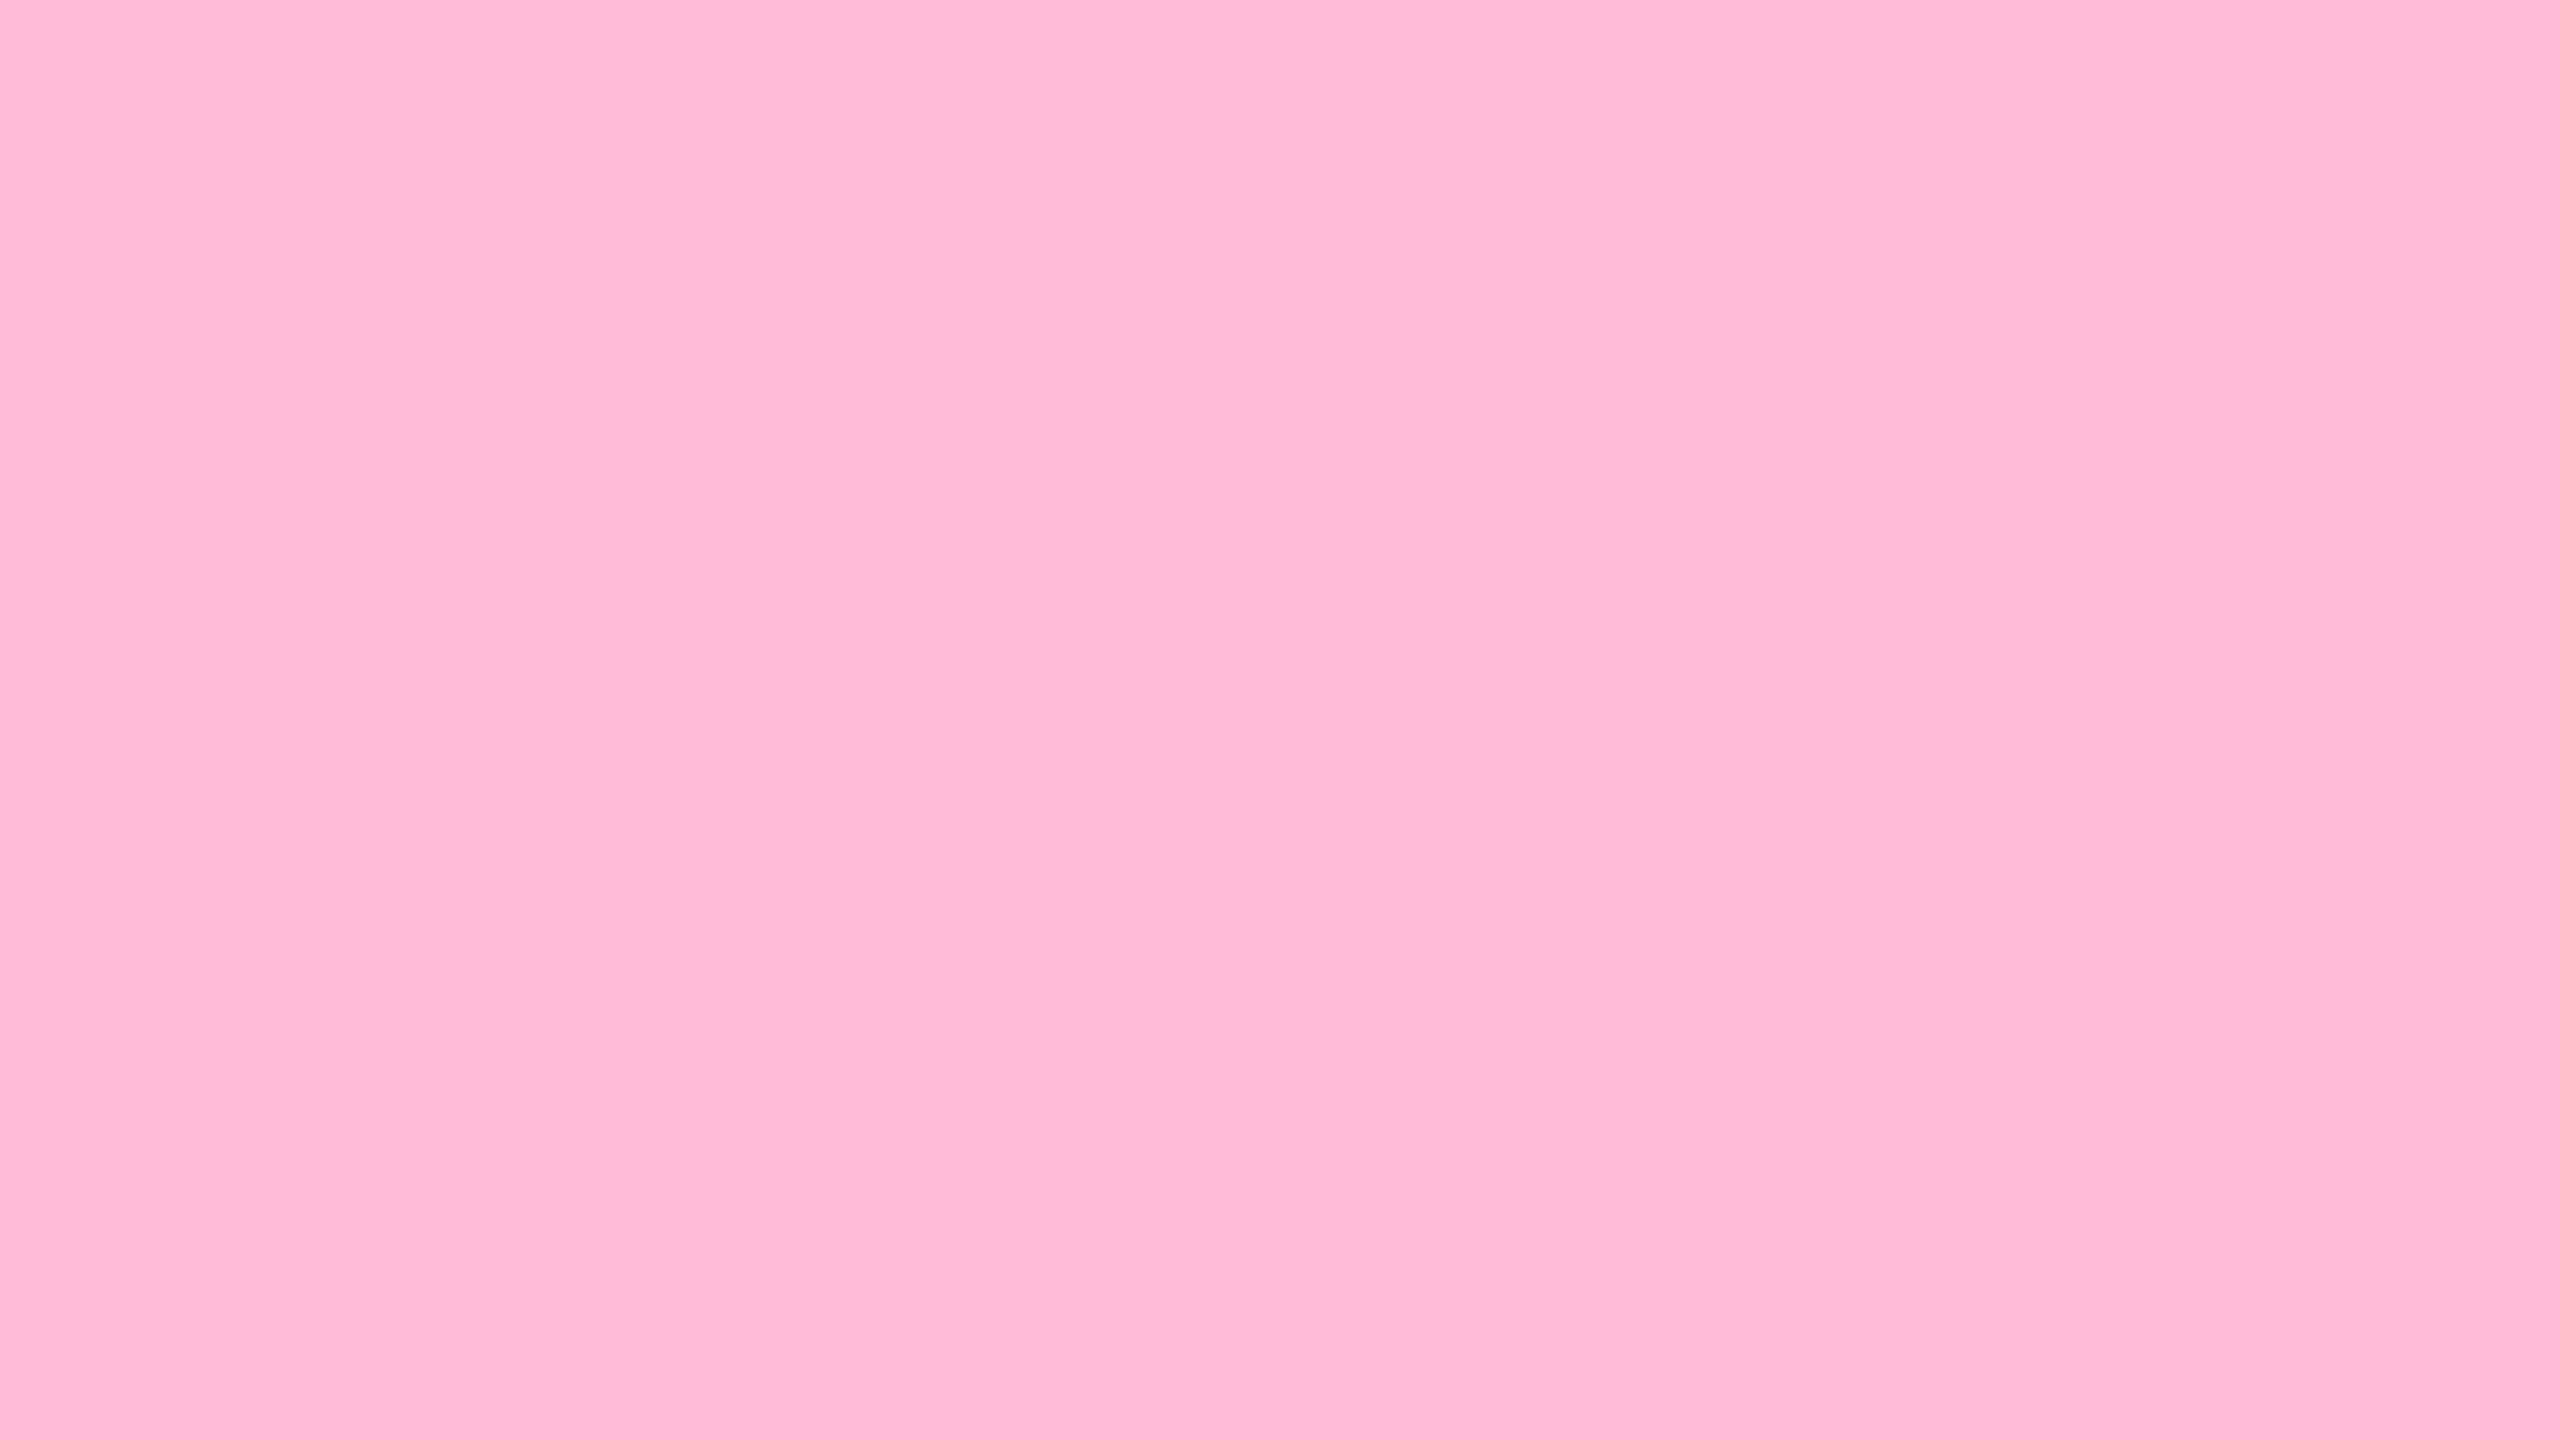 Color Cotton Candy Cotton Candy Solid Color